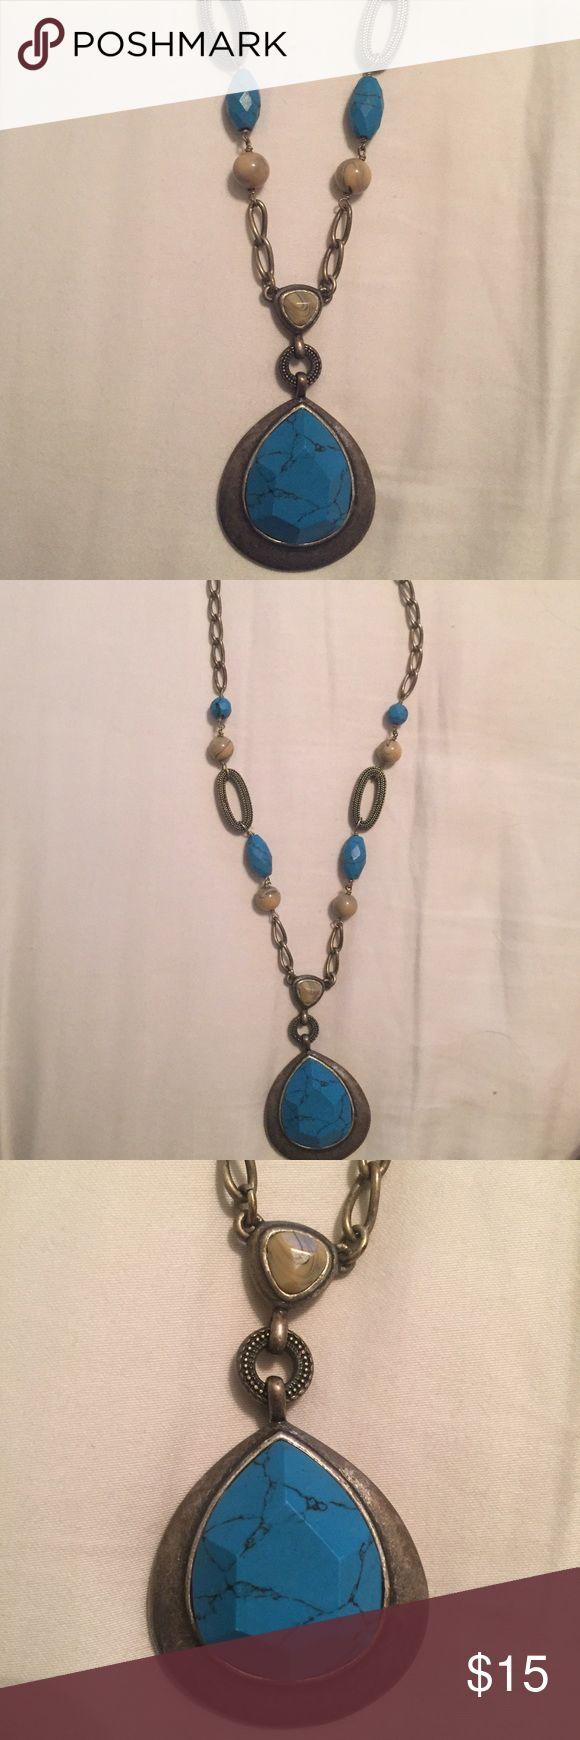 Lia Sophia necklace Great lia Sophia necklace with adjustable chain. Great condition! Lia Sophia Jewelry Necklaces